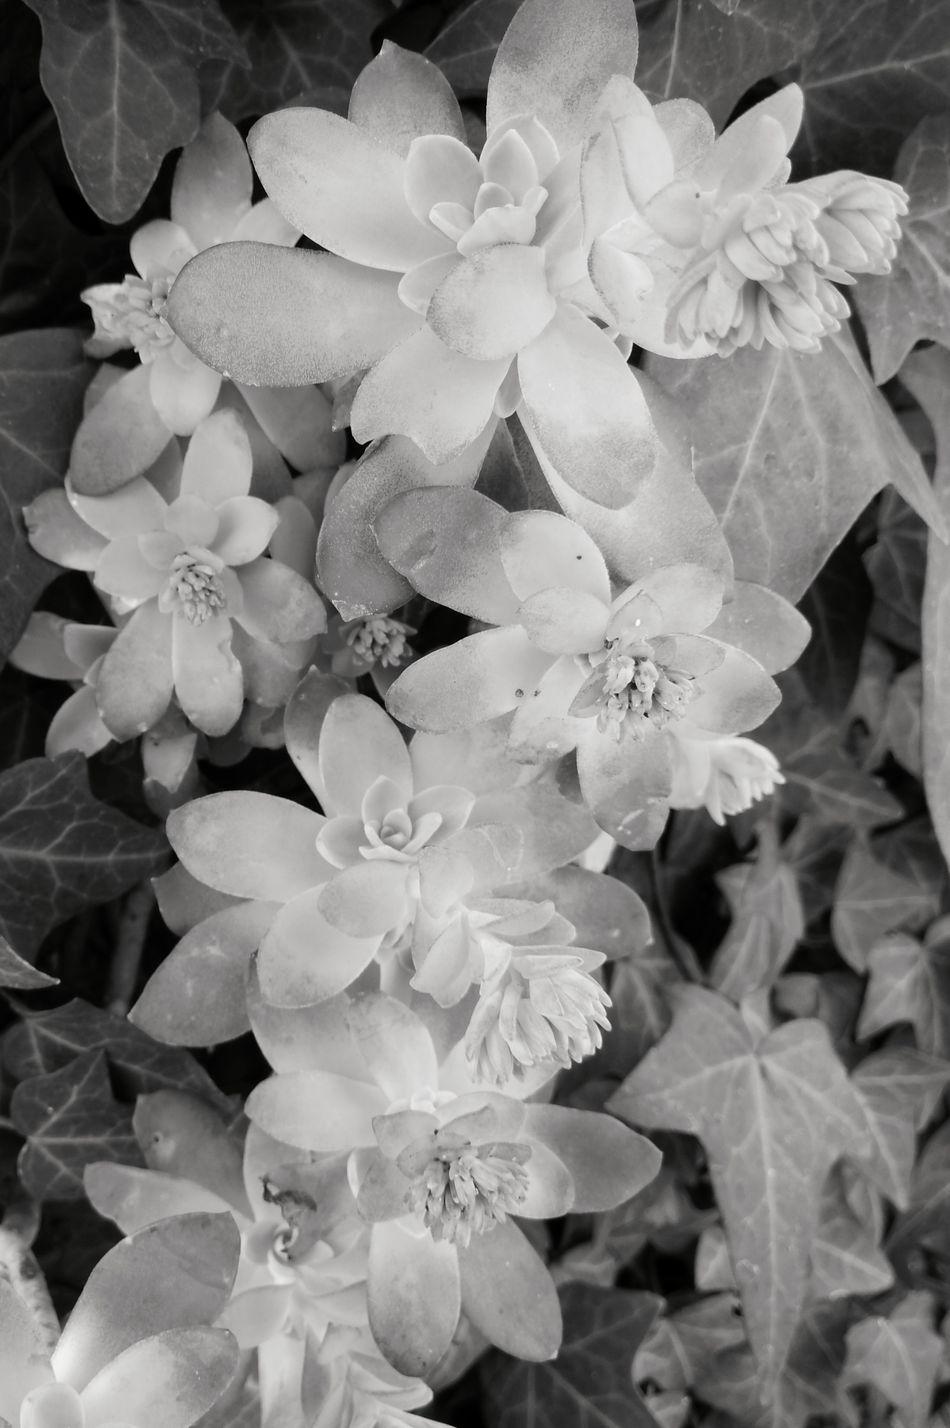 Beauty In Nature Black And White Blackandwhite Flower Fragility Freshness Nature Petal